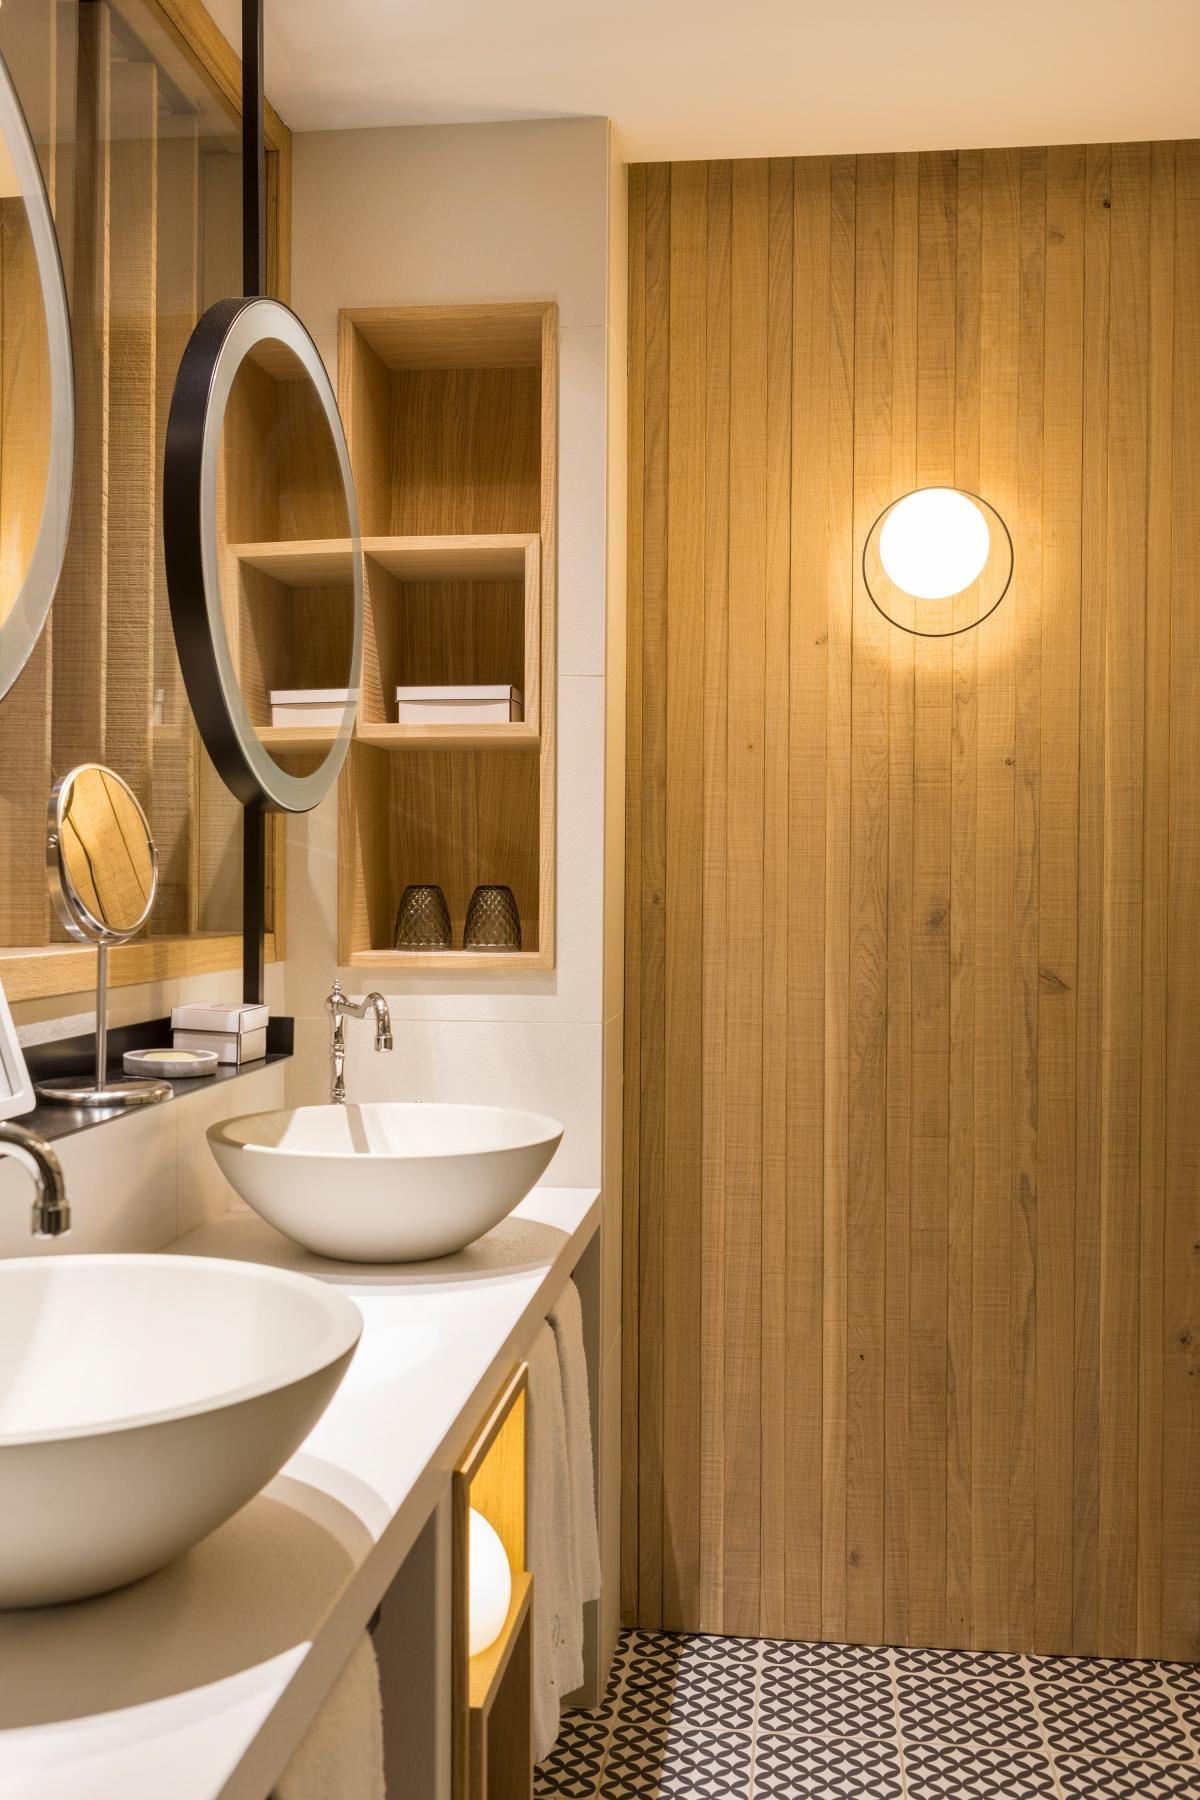 Foto de Aplique de pared redondo Circ de Interior en Negro en un baño. Estiluz